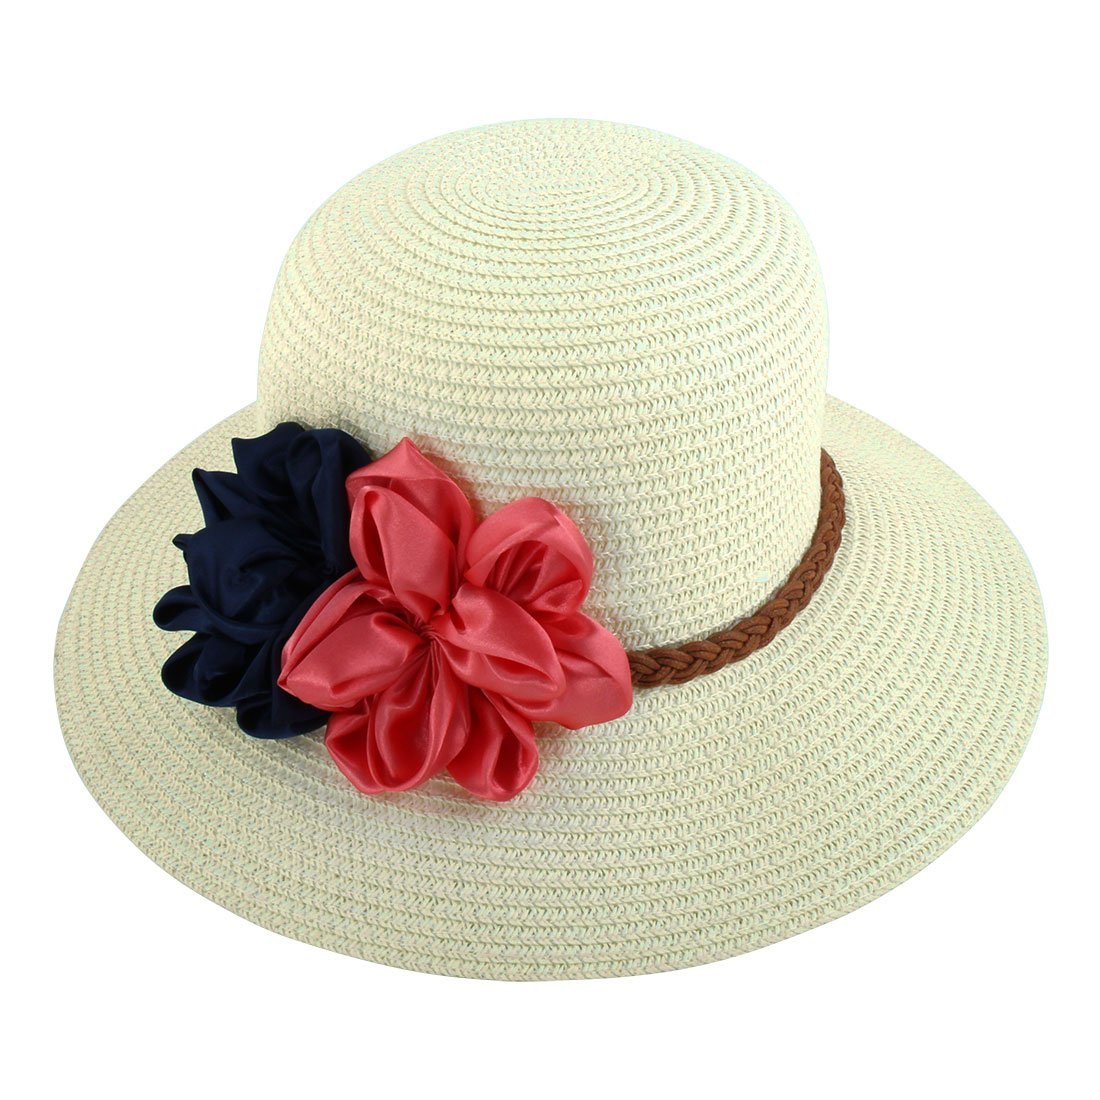 bbd83082 White : Generic Lady Traveling Straw Braided Flowers Decor Beach Sun Bucket  Hat Sunhat: Amazon.in: Home & Kitchen